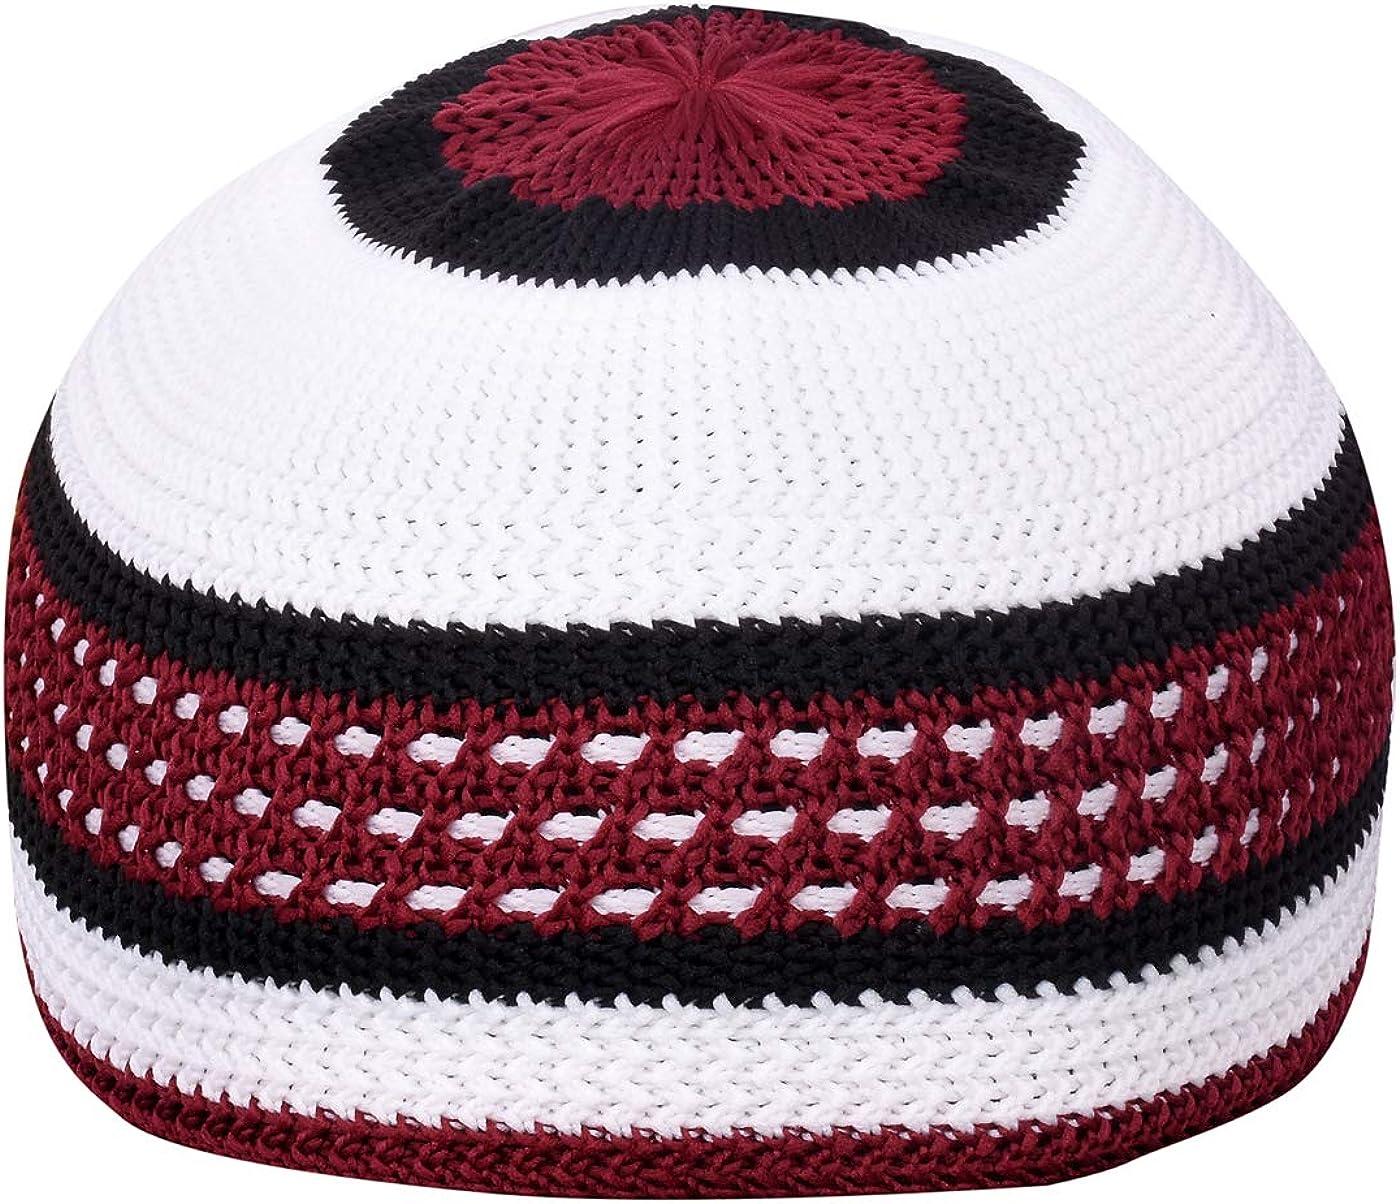 Manaal Enterprises Islamic Skull Beanies Men/'s Muslim Islamic Koofi Prayer Namaz Topi Skull Kufi Cap Blend Cotton Hat Size 21,22,23 Inches Stretchable Also can wear